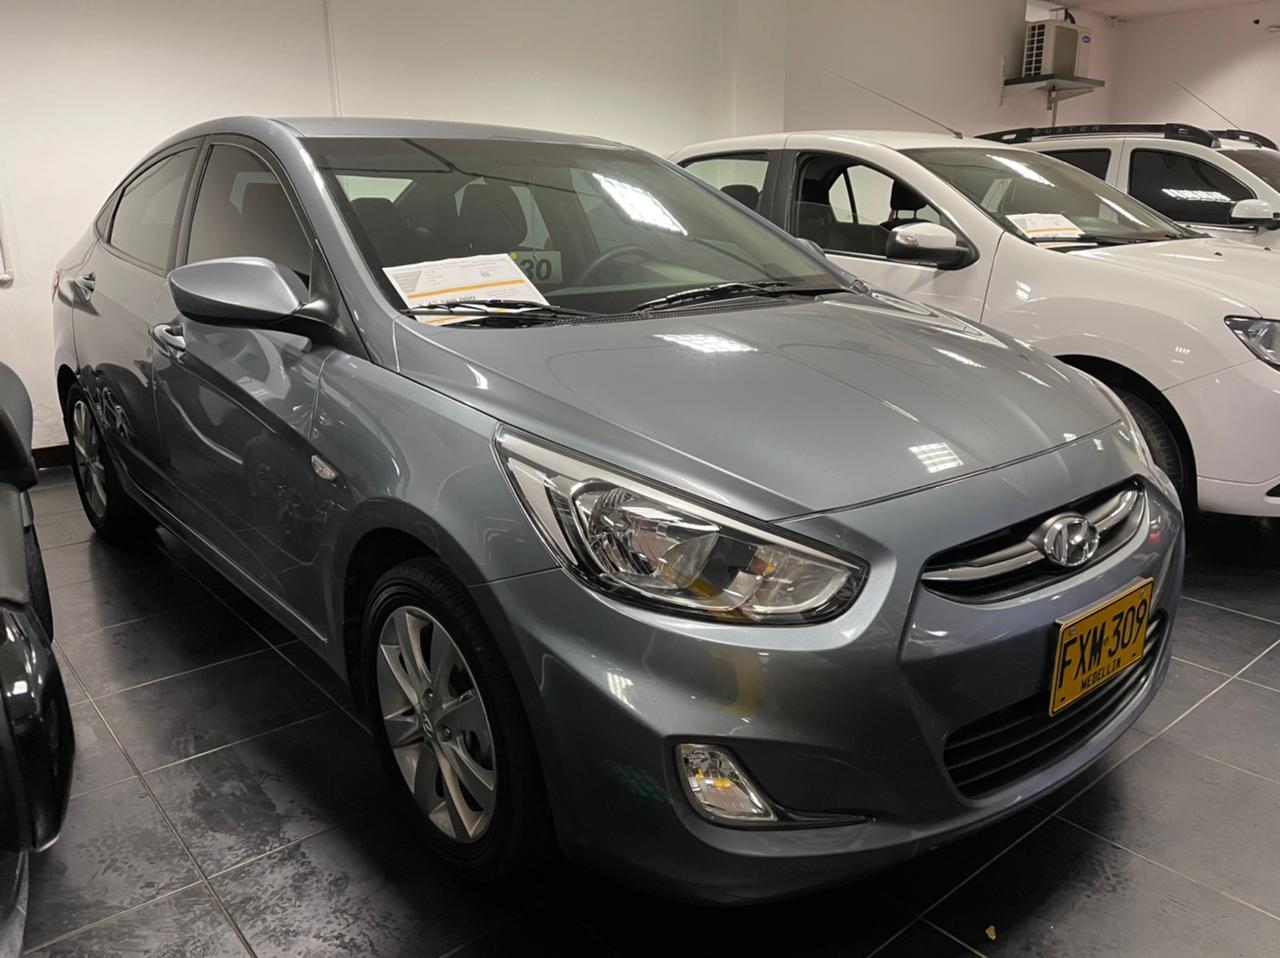 Hyundai-Accent-01442180-1